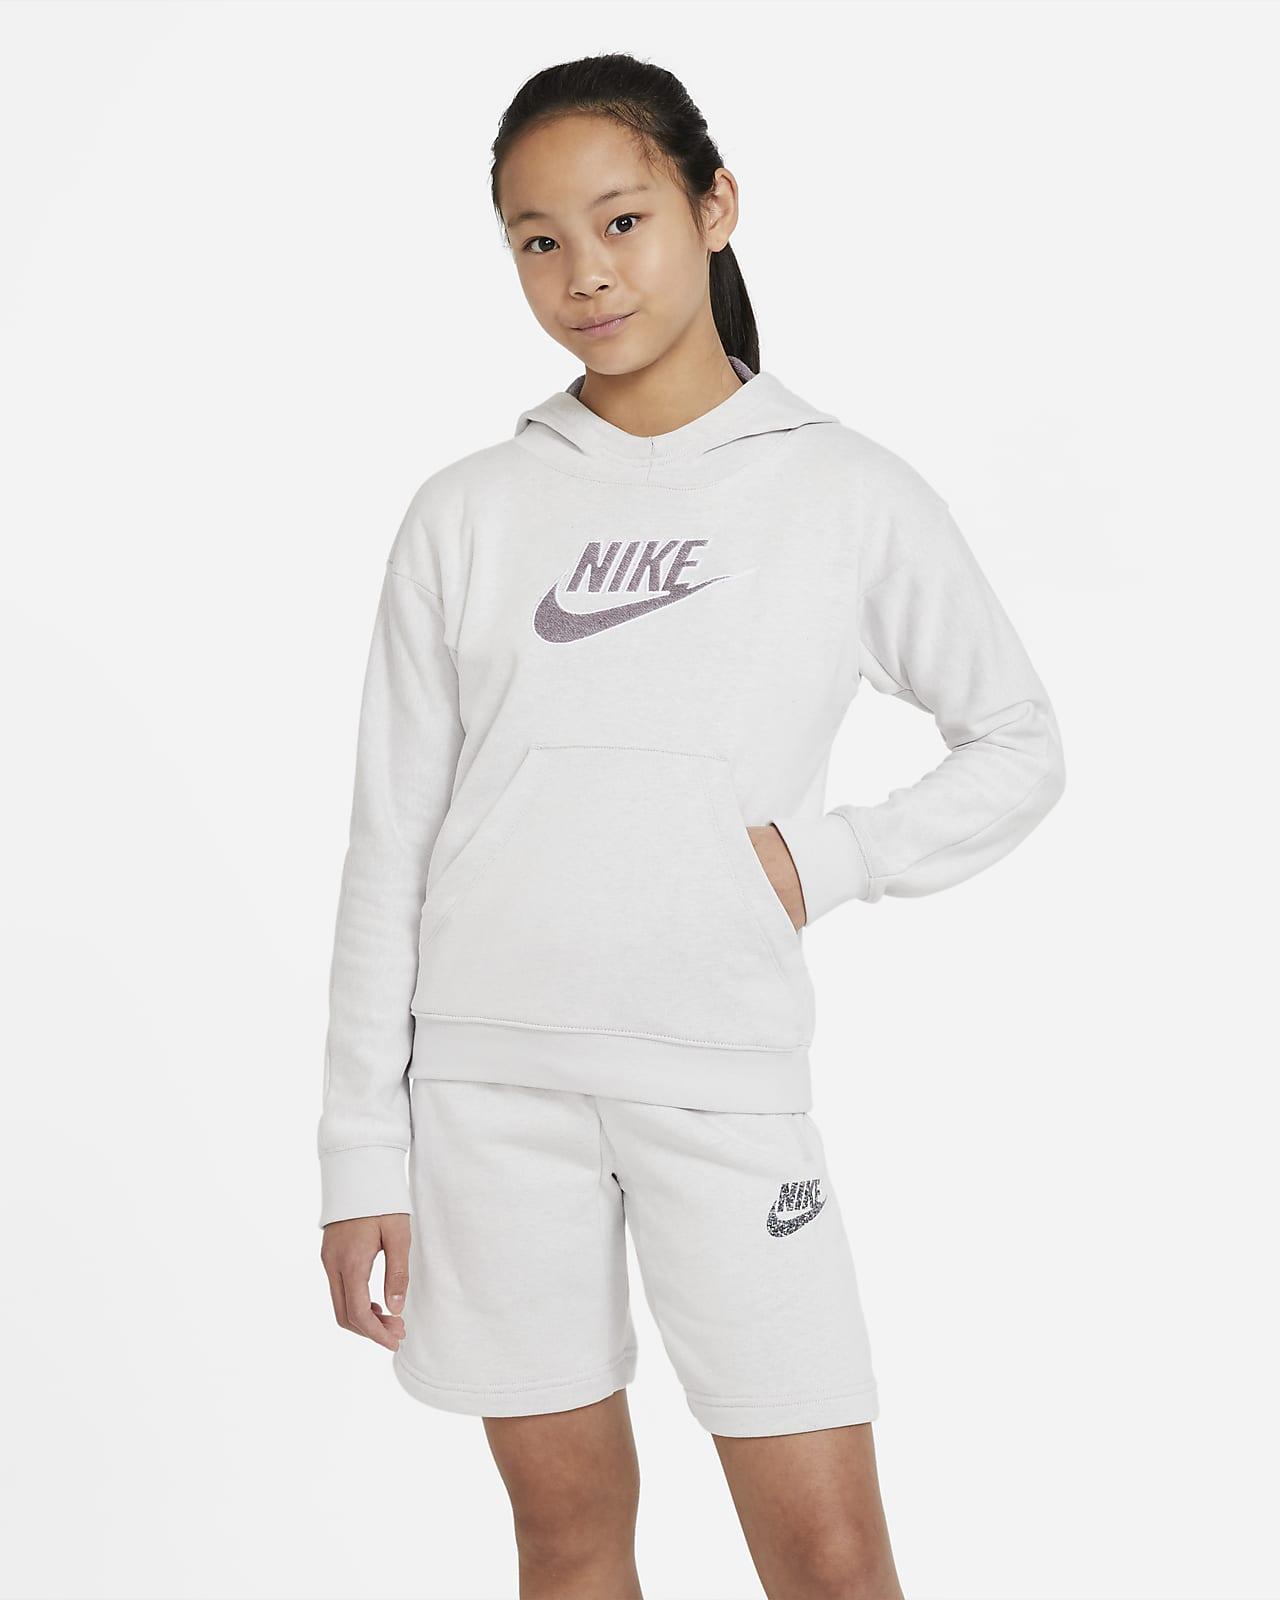 Hoodie pullover Nike Sportswear Júnior